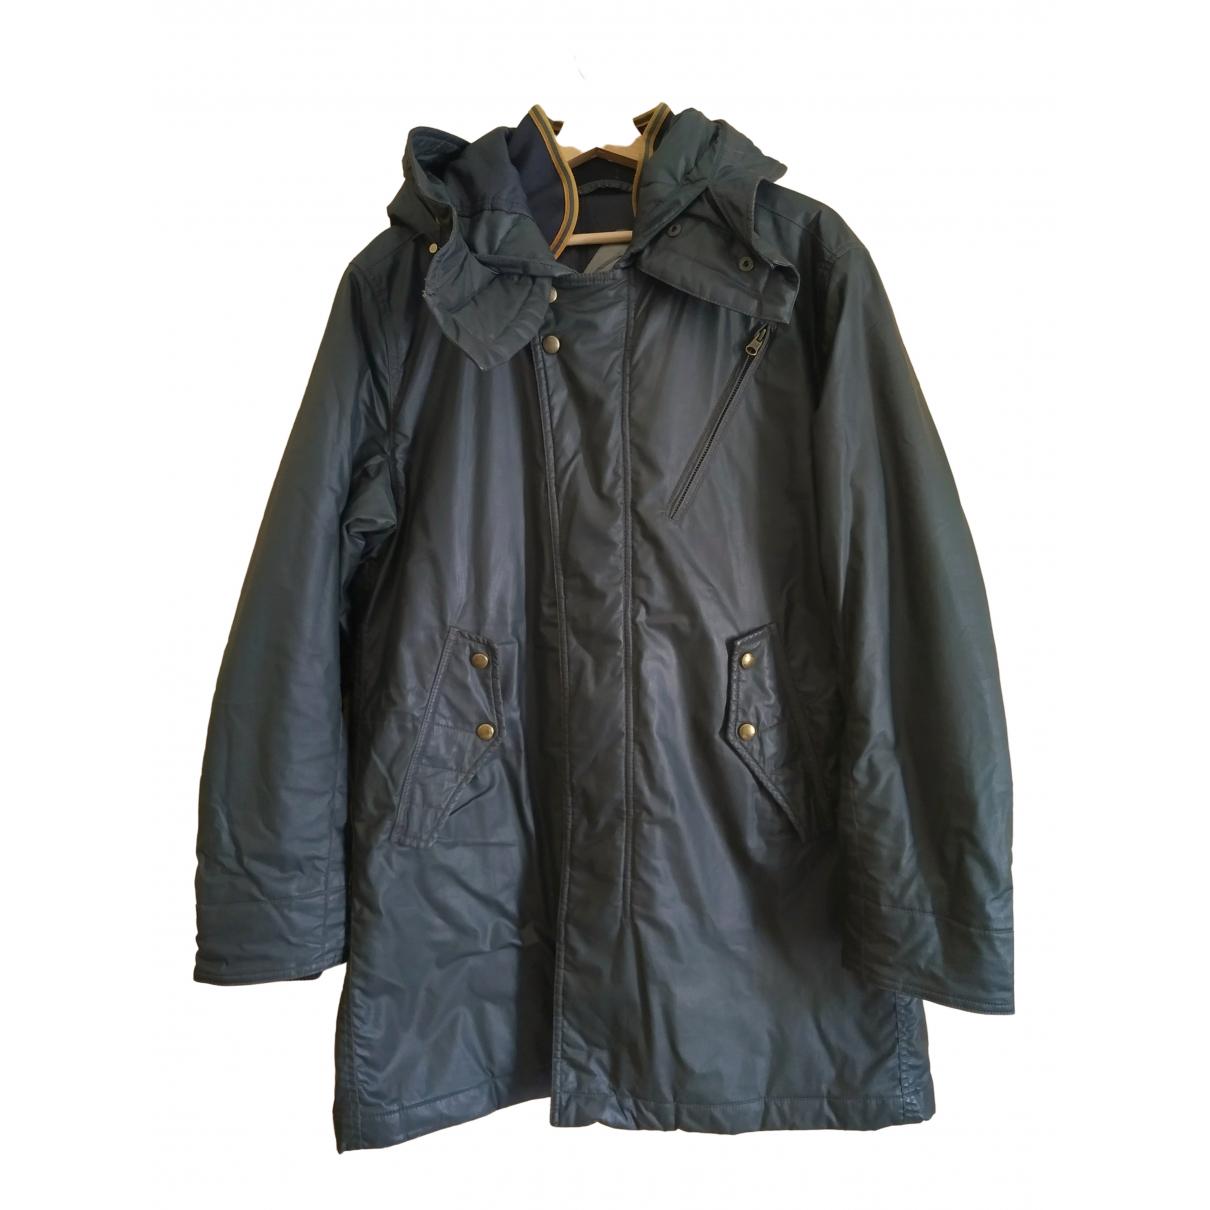 Hogan \N Green Cotton jacket  for Men M International